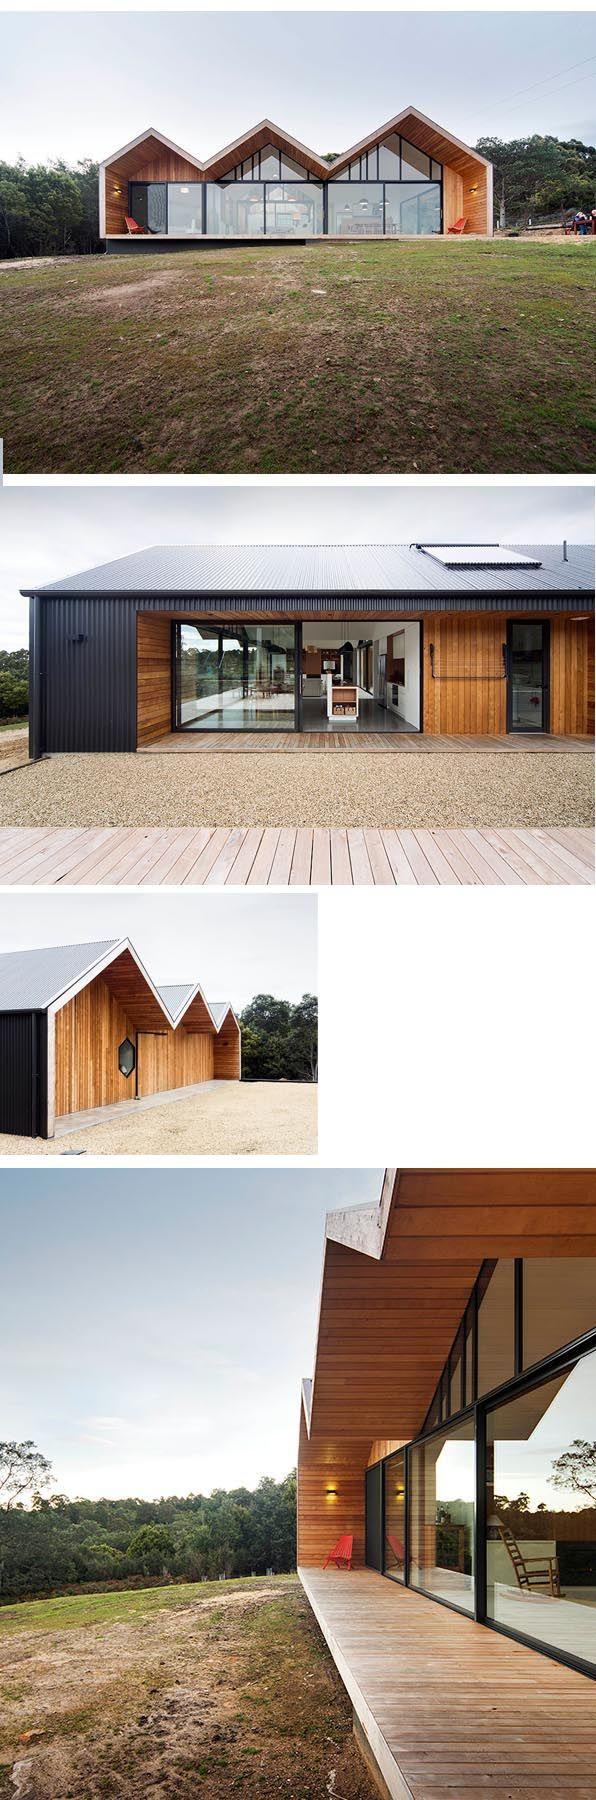 una casa dedicada a la contemplaci n arquitectura prefabricada modular industrializada a house. Black Bedroom Furniture Sets. Home Design Ideas